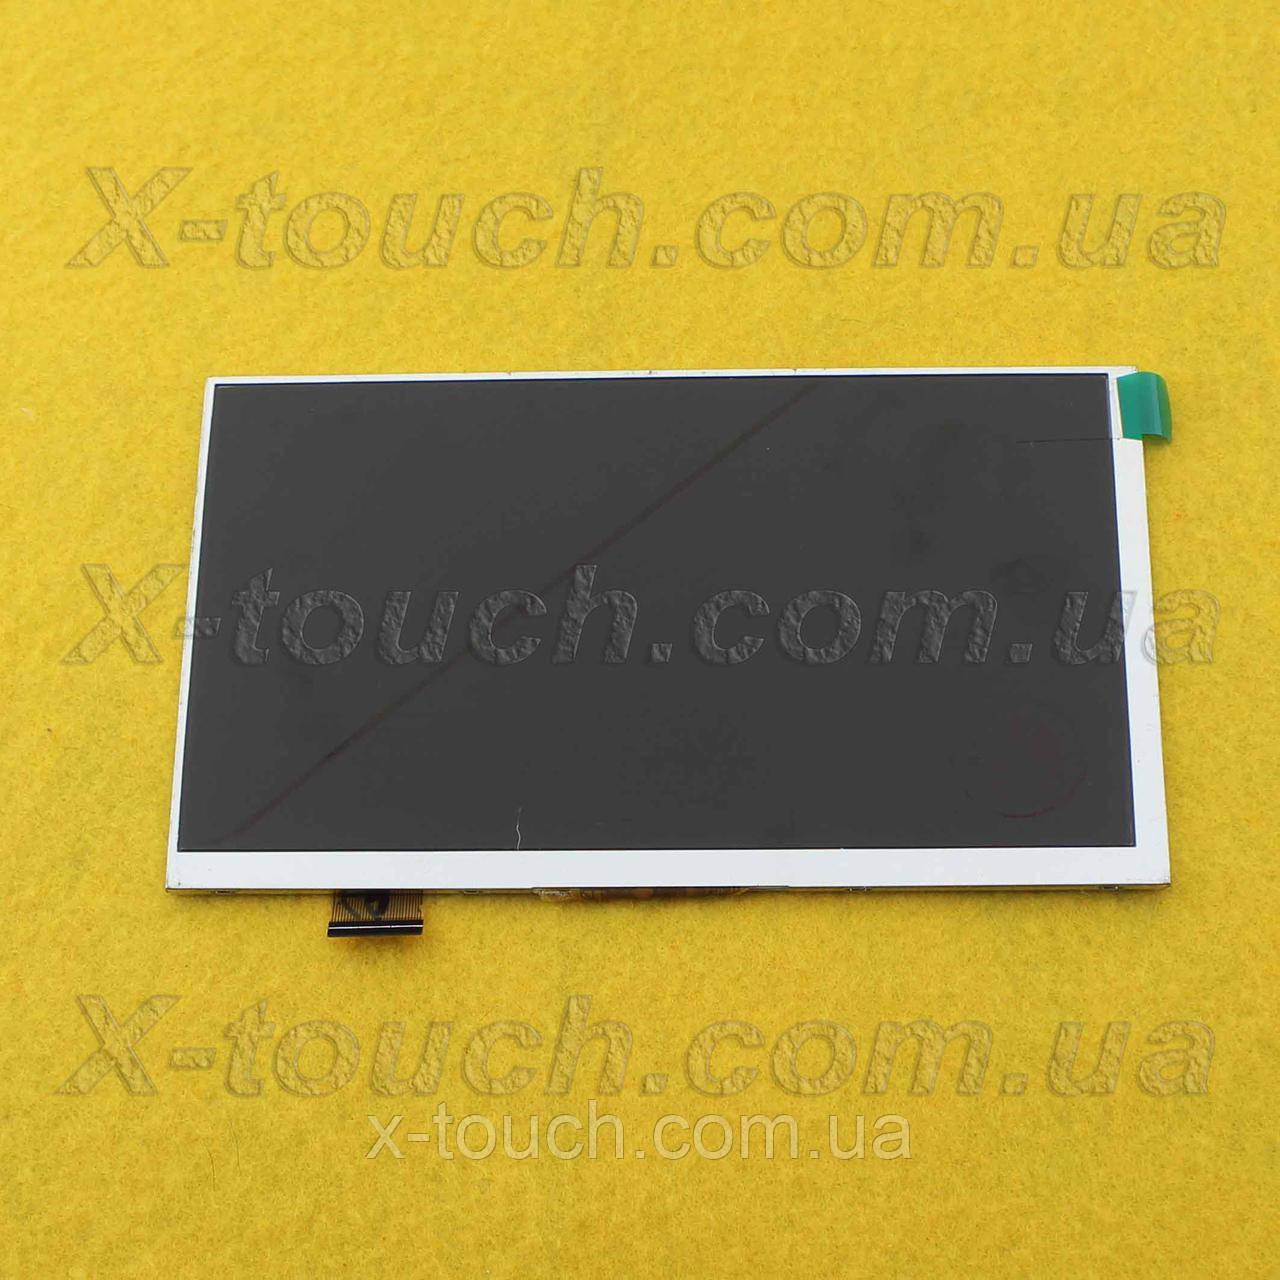 Матрица,экран, дисплей Digma Optima 7.07 3G (TT7007MG) для планшета